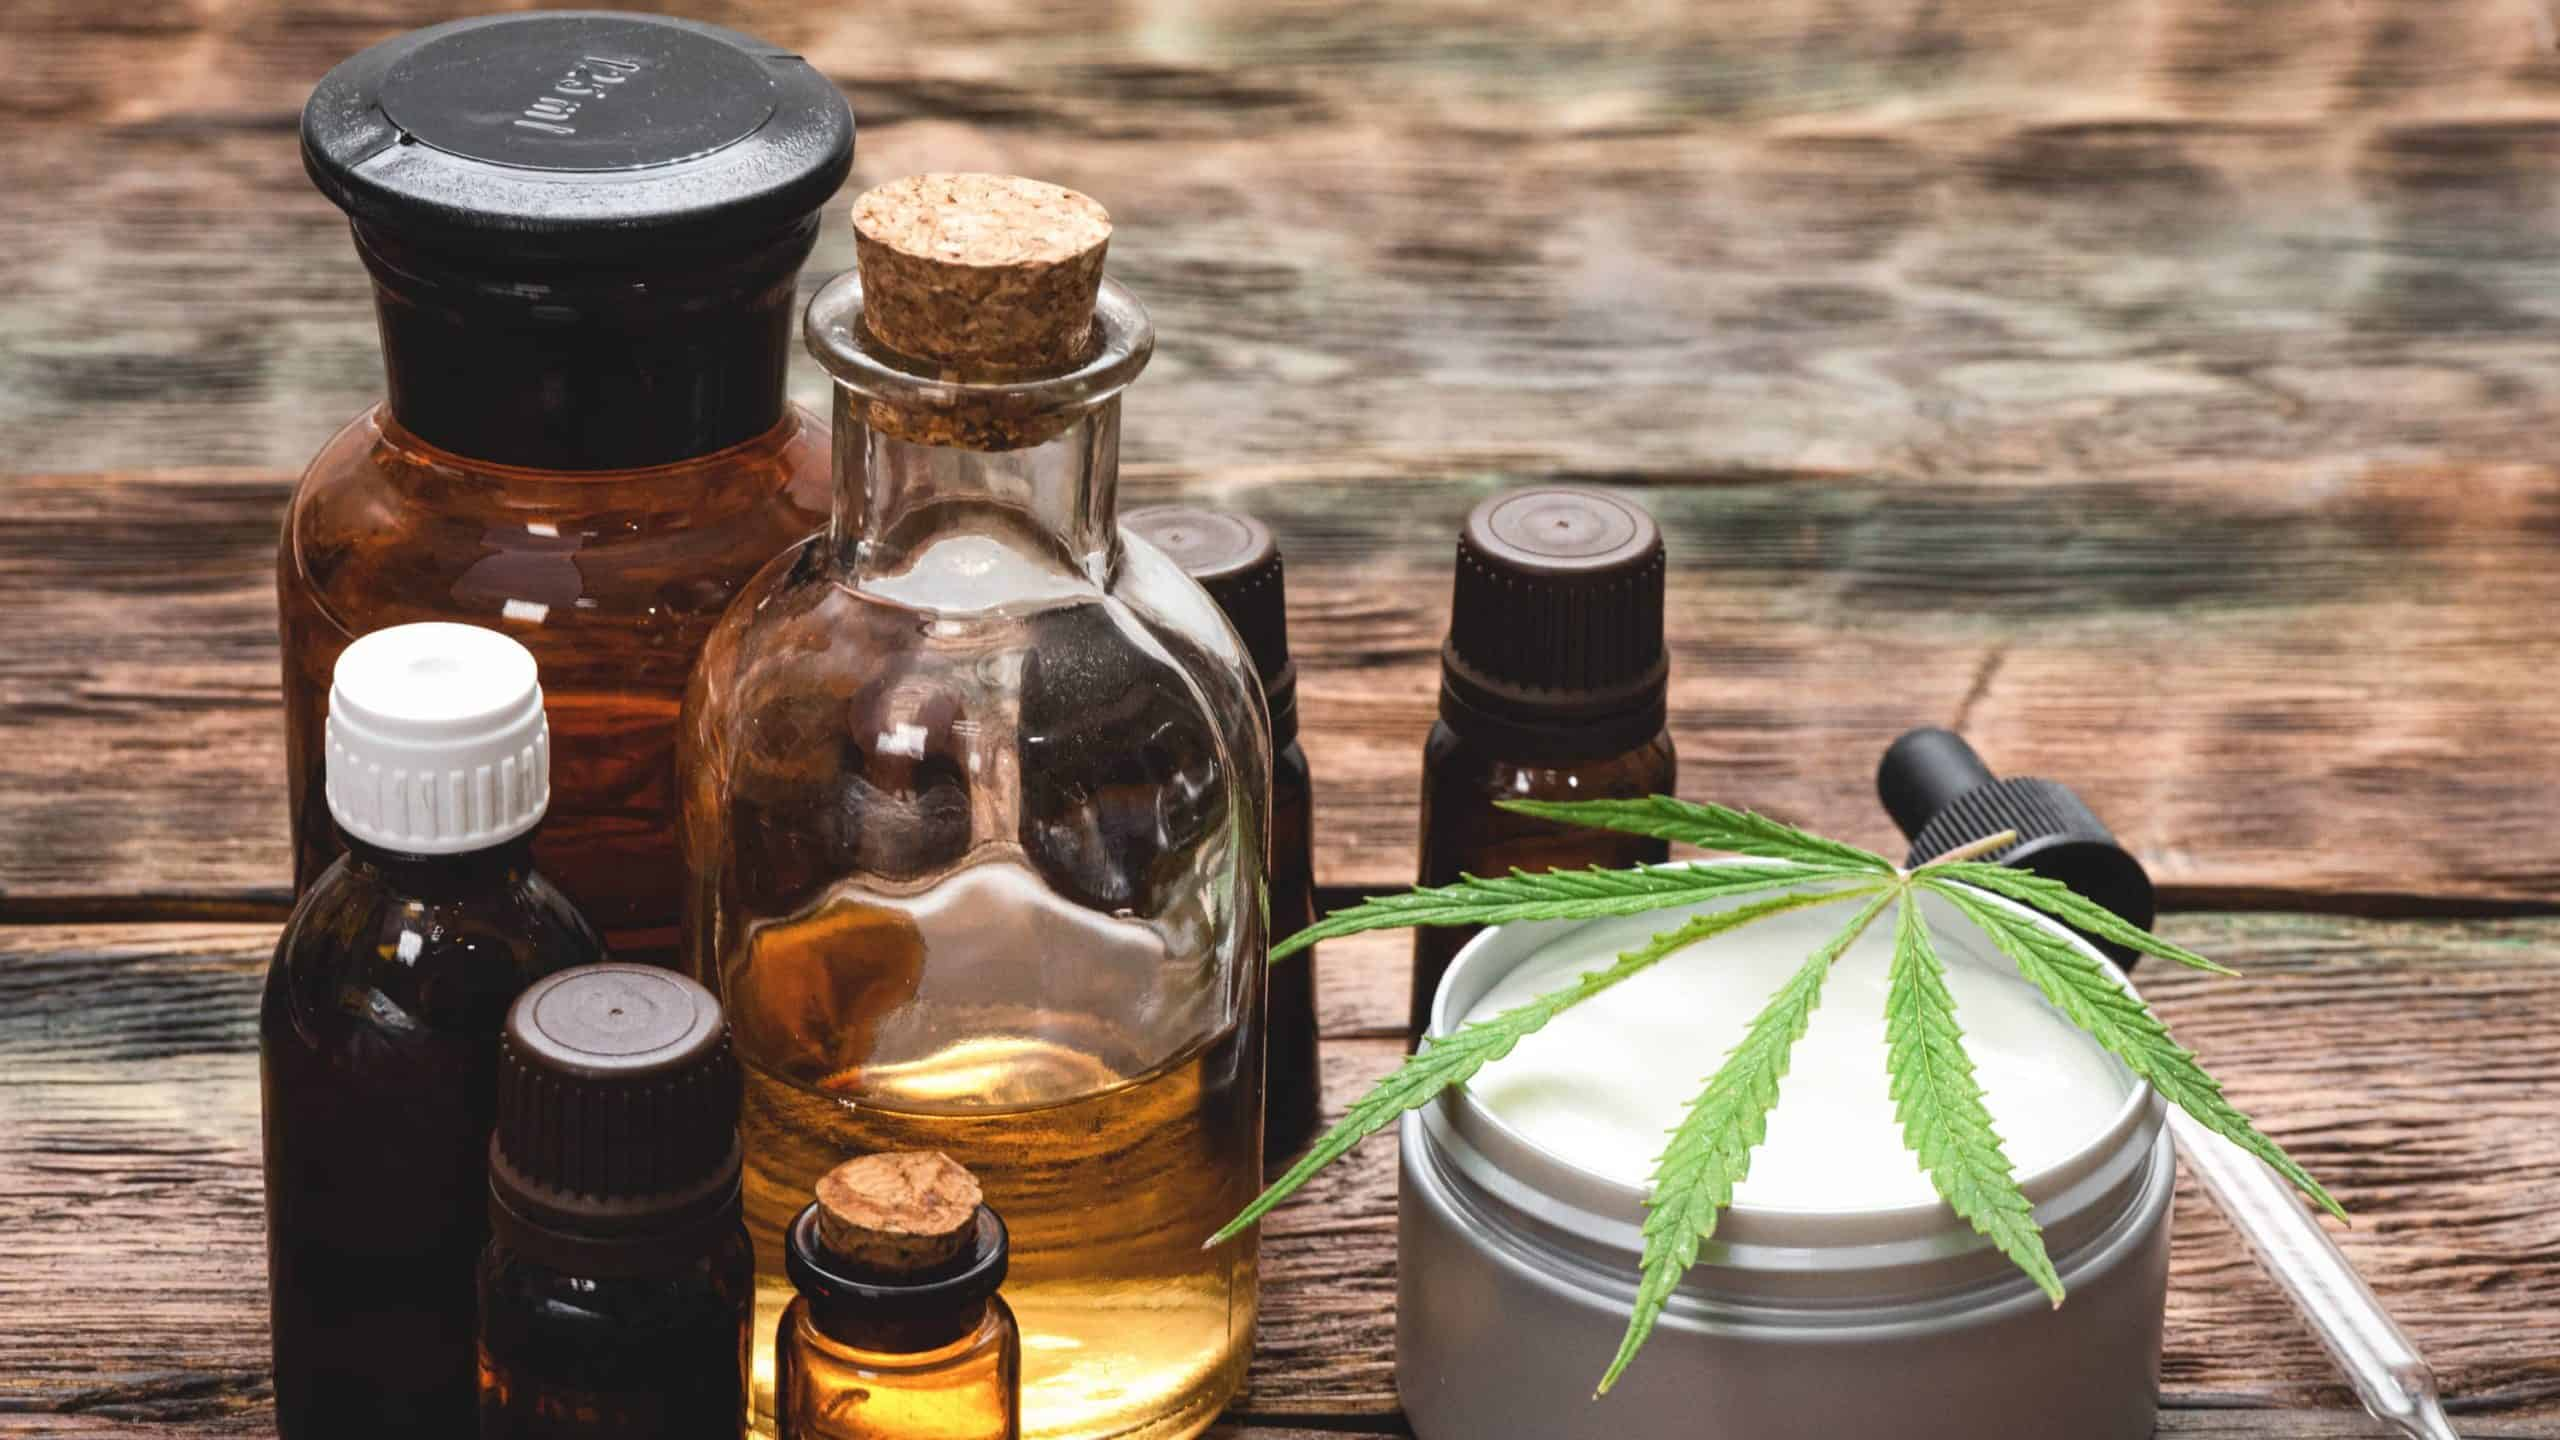 range of hemp oil and skin products representing elixinol share price